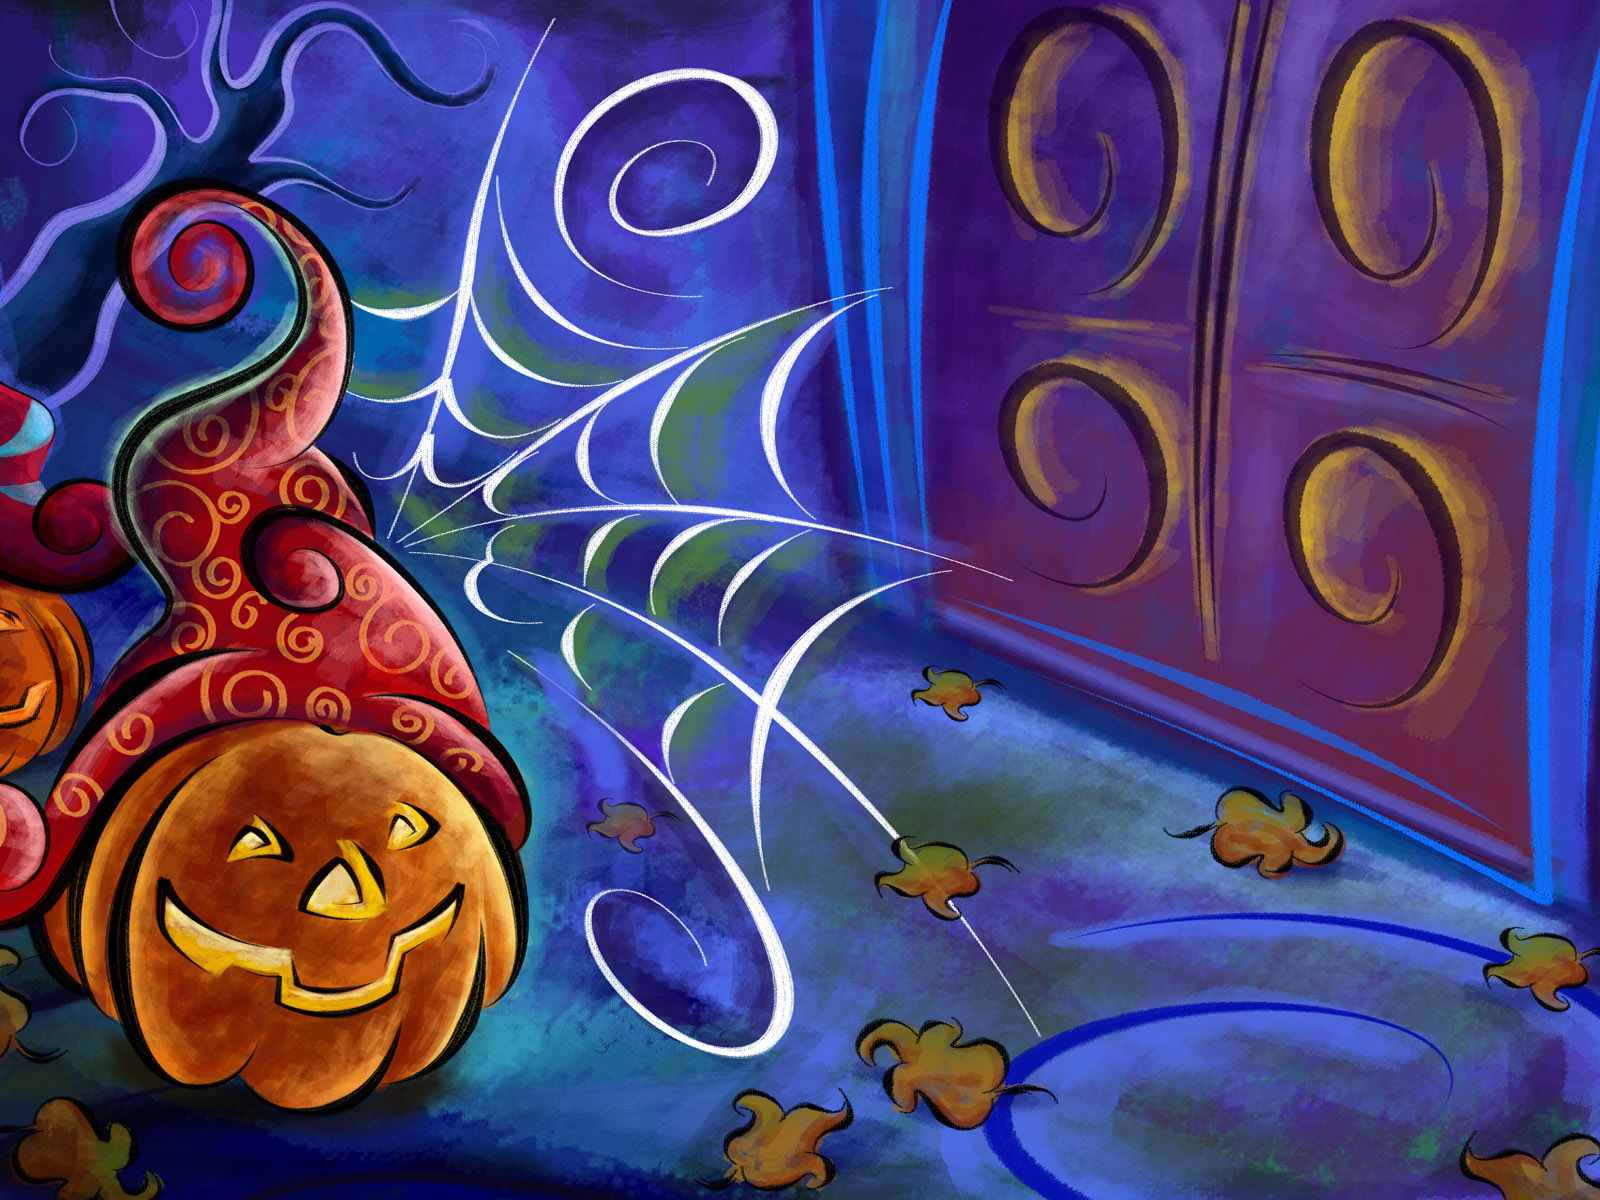 A pumpkin and a spiderweb.